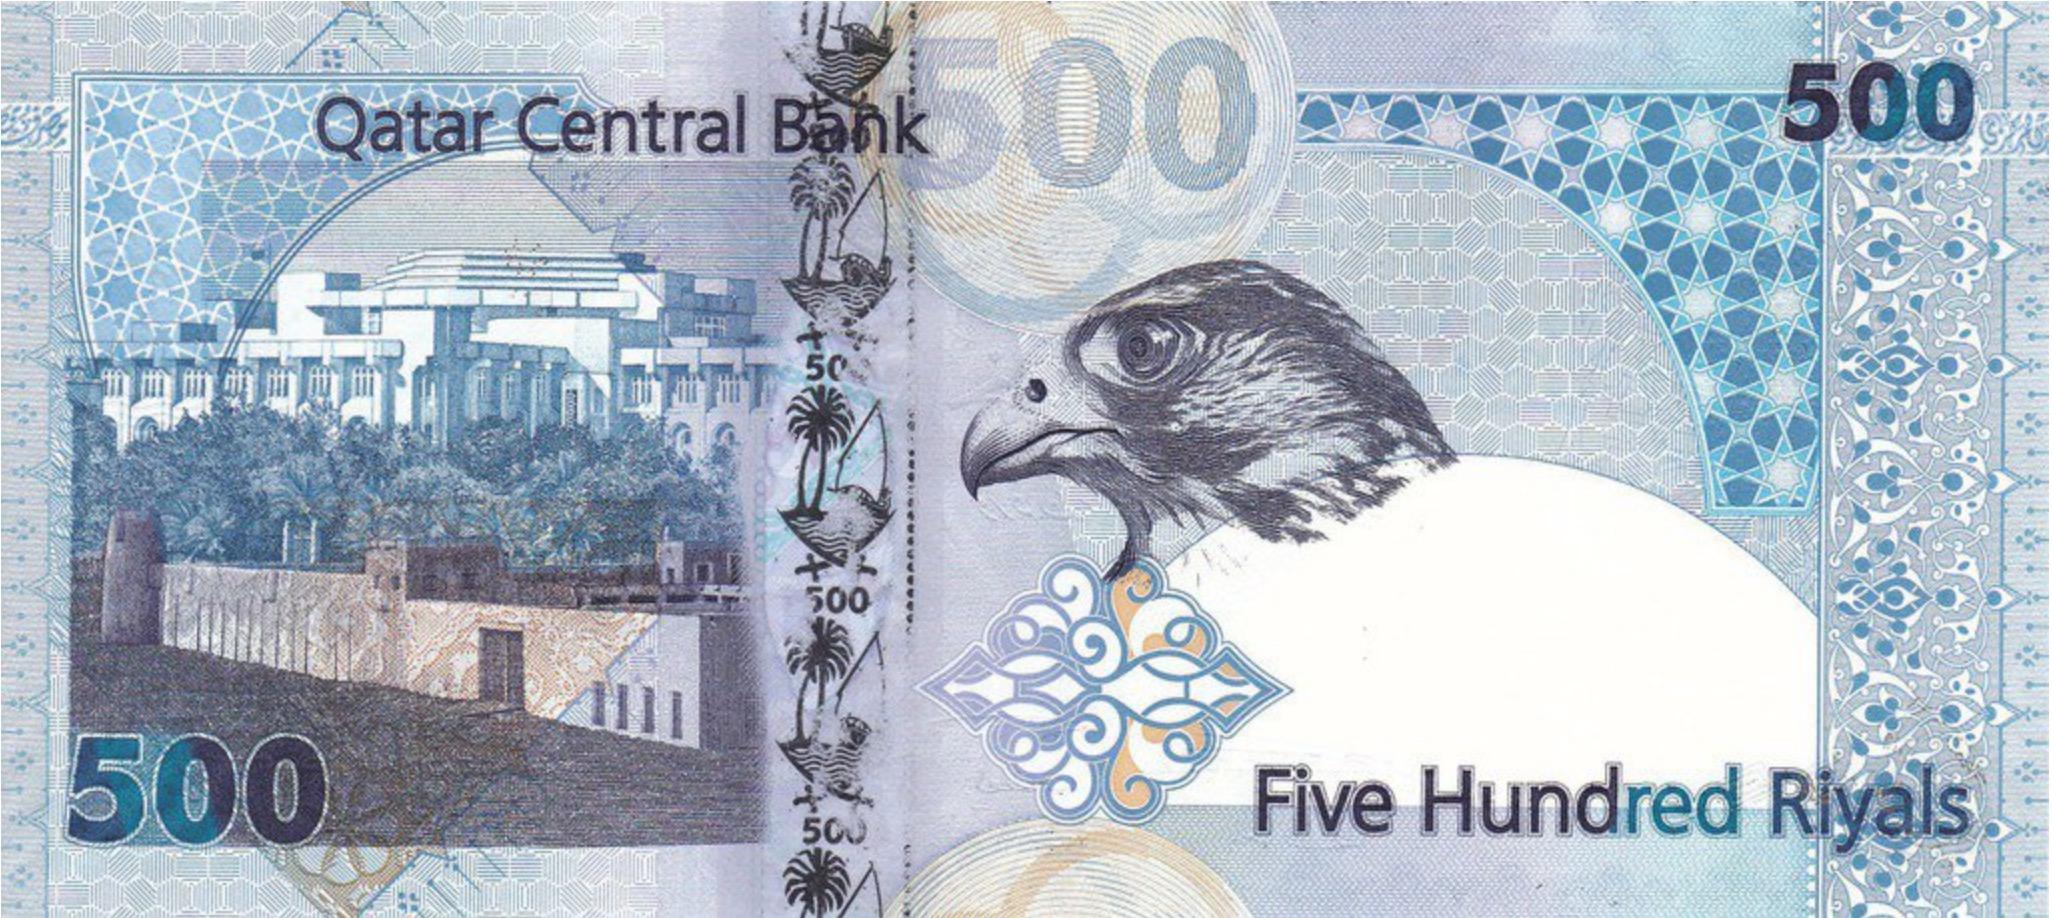 500 Qatari Riyals banknote (Fourth Issue with transparent window)